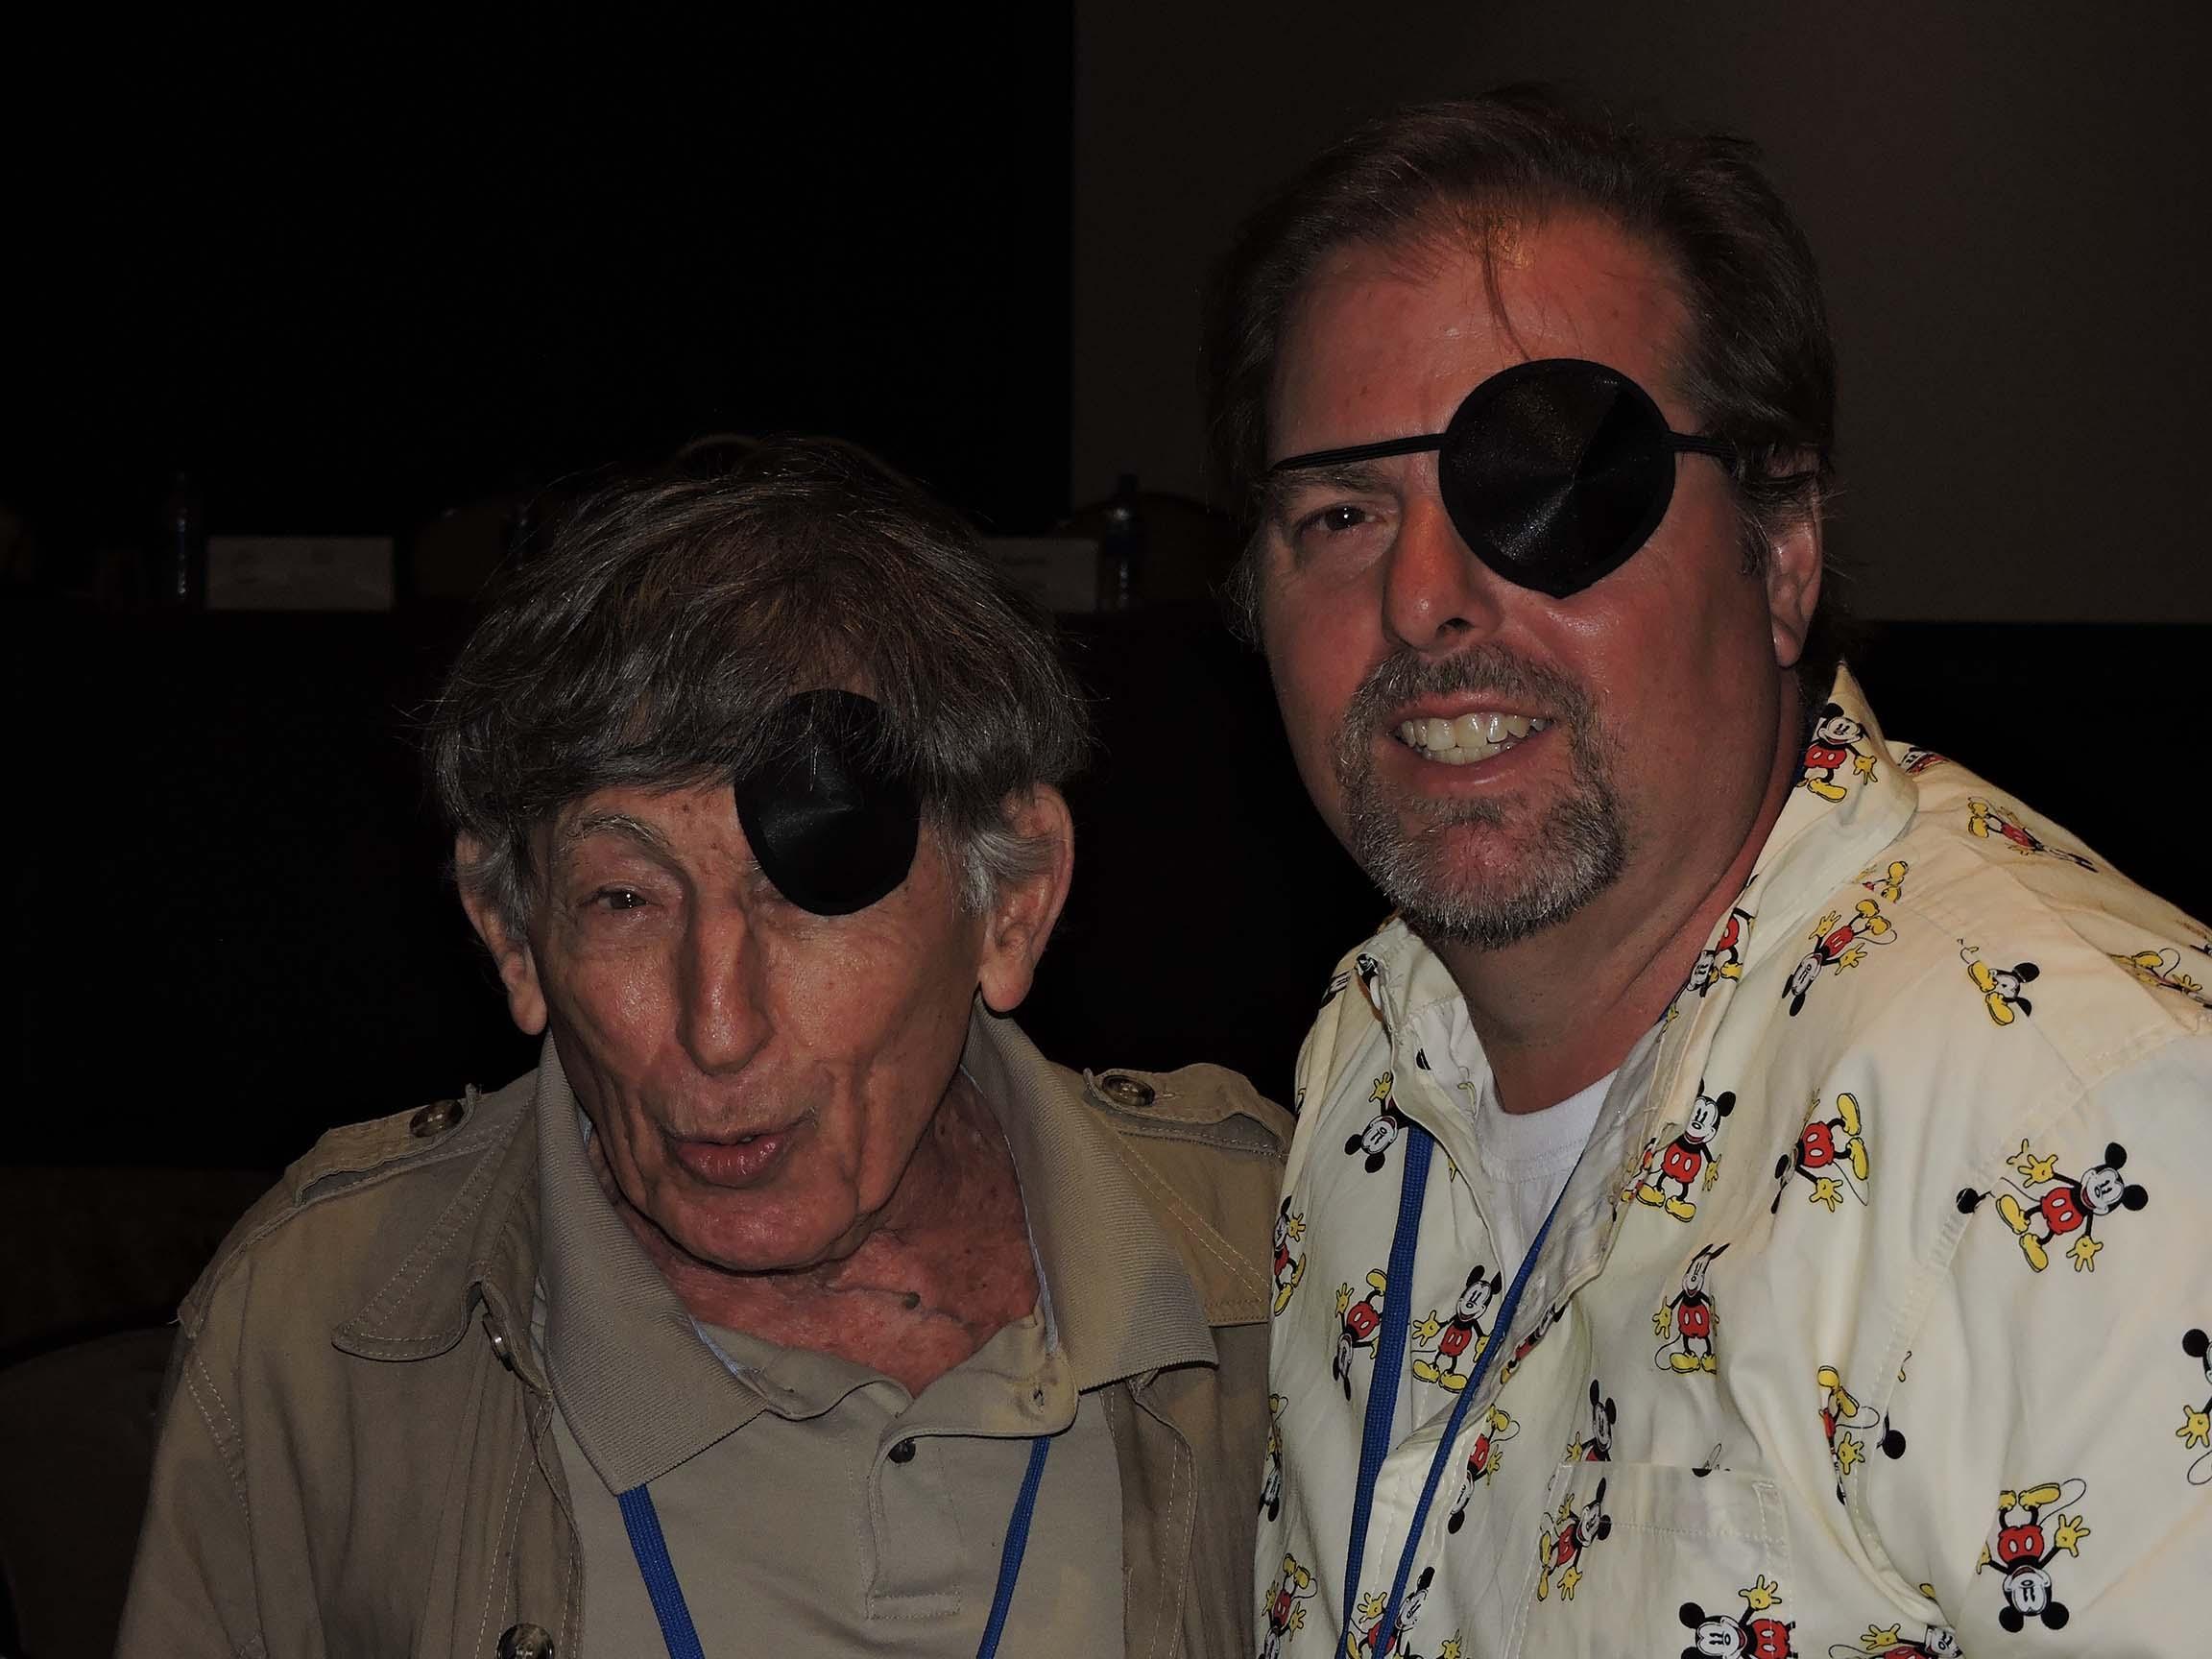 Mort Gerberg (left) and Bob East